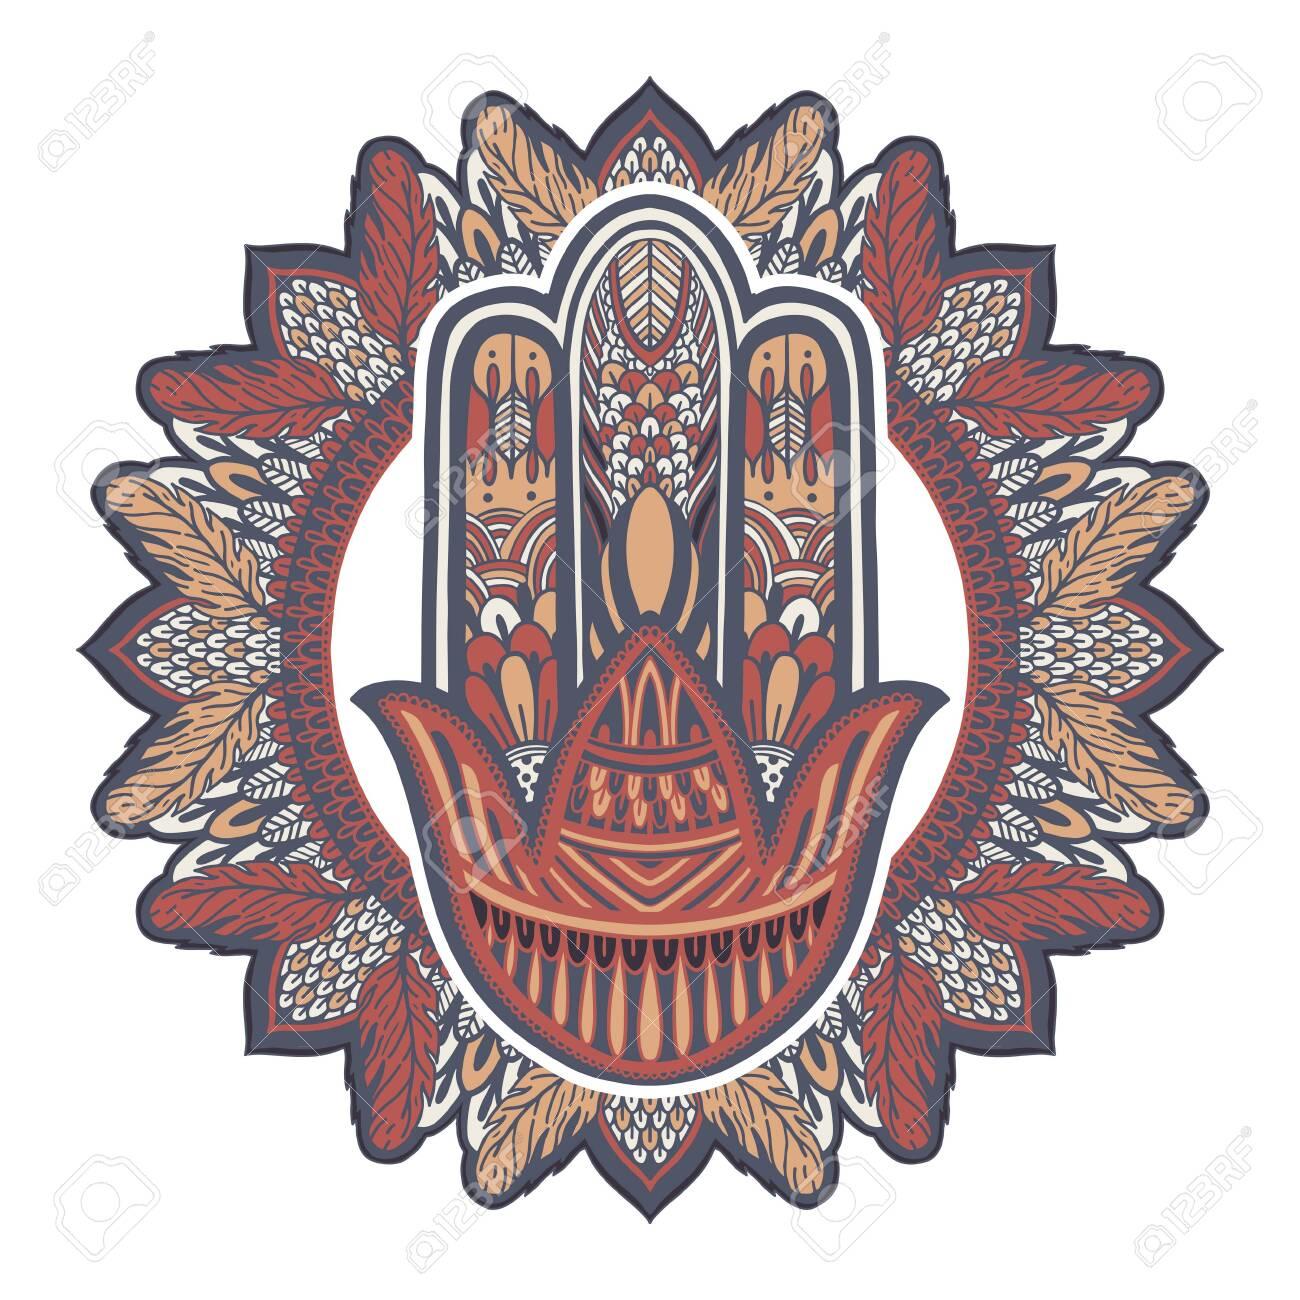 Hamsa talisman religion Asian  Symbol of protection and talisman